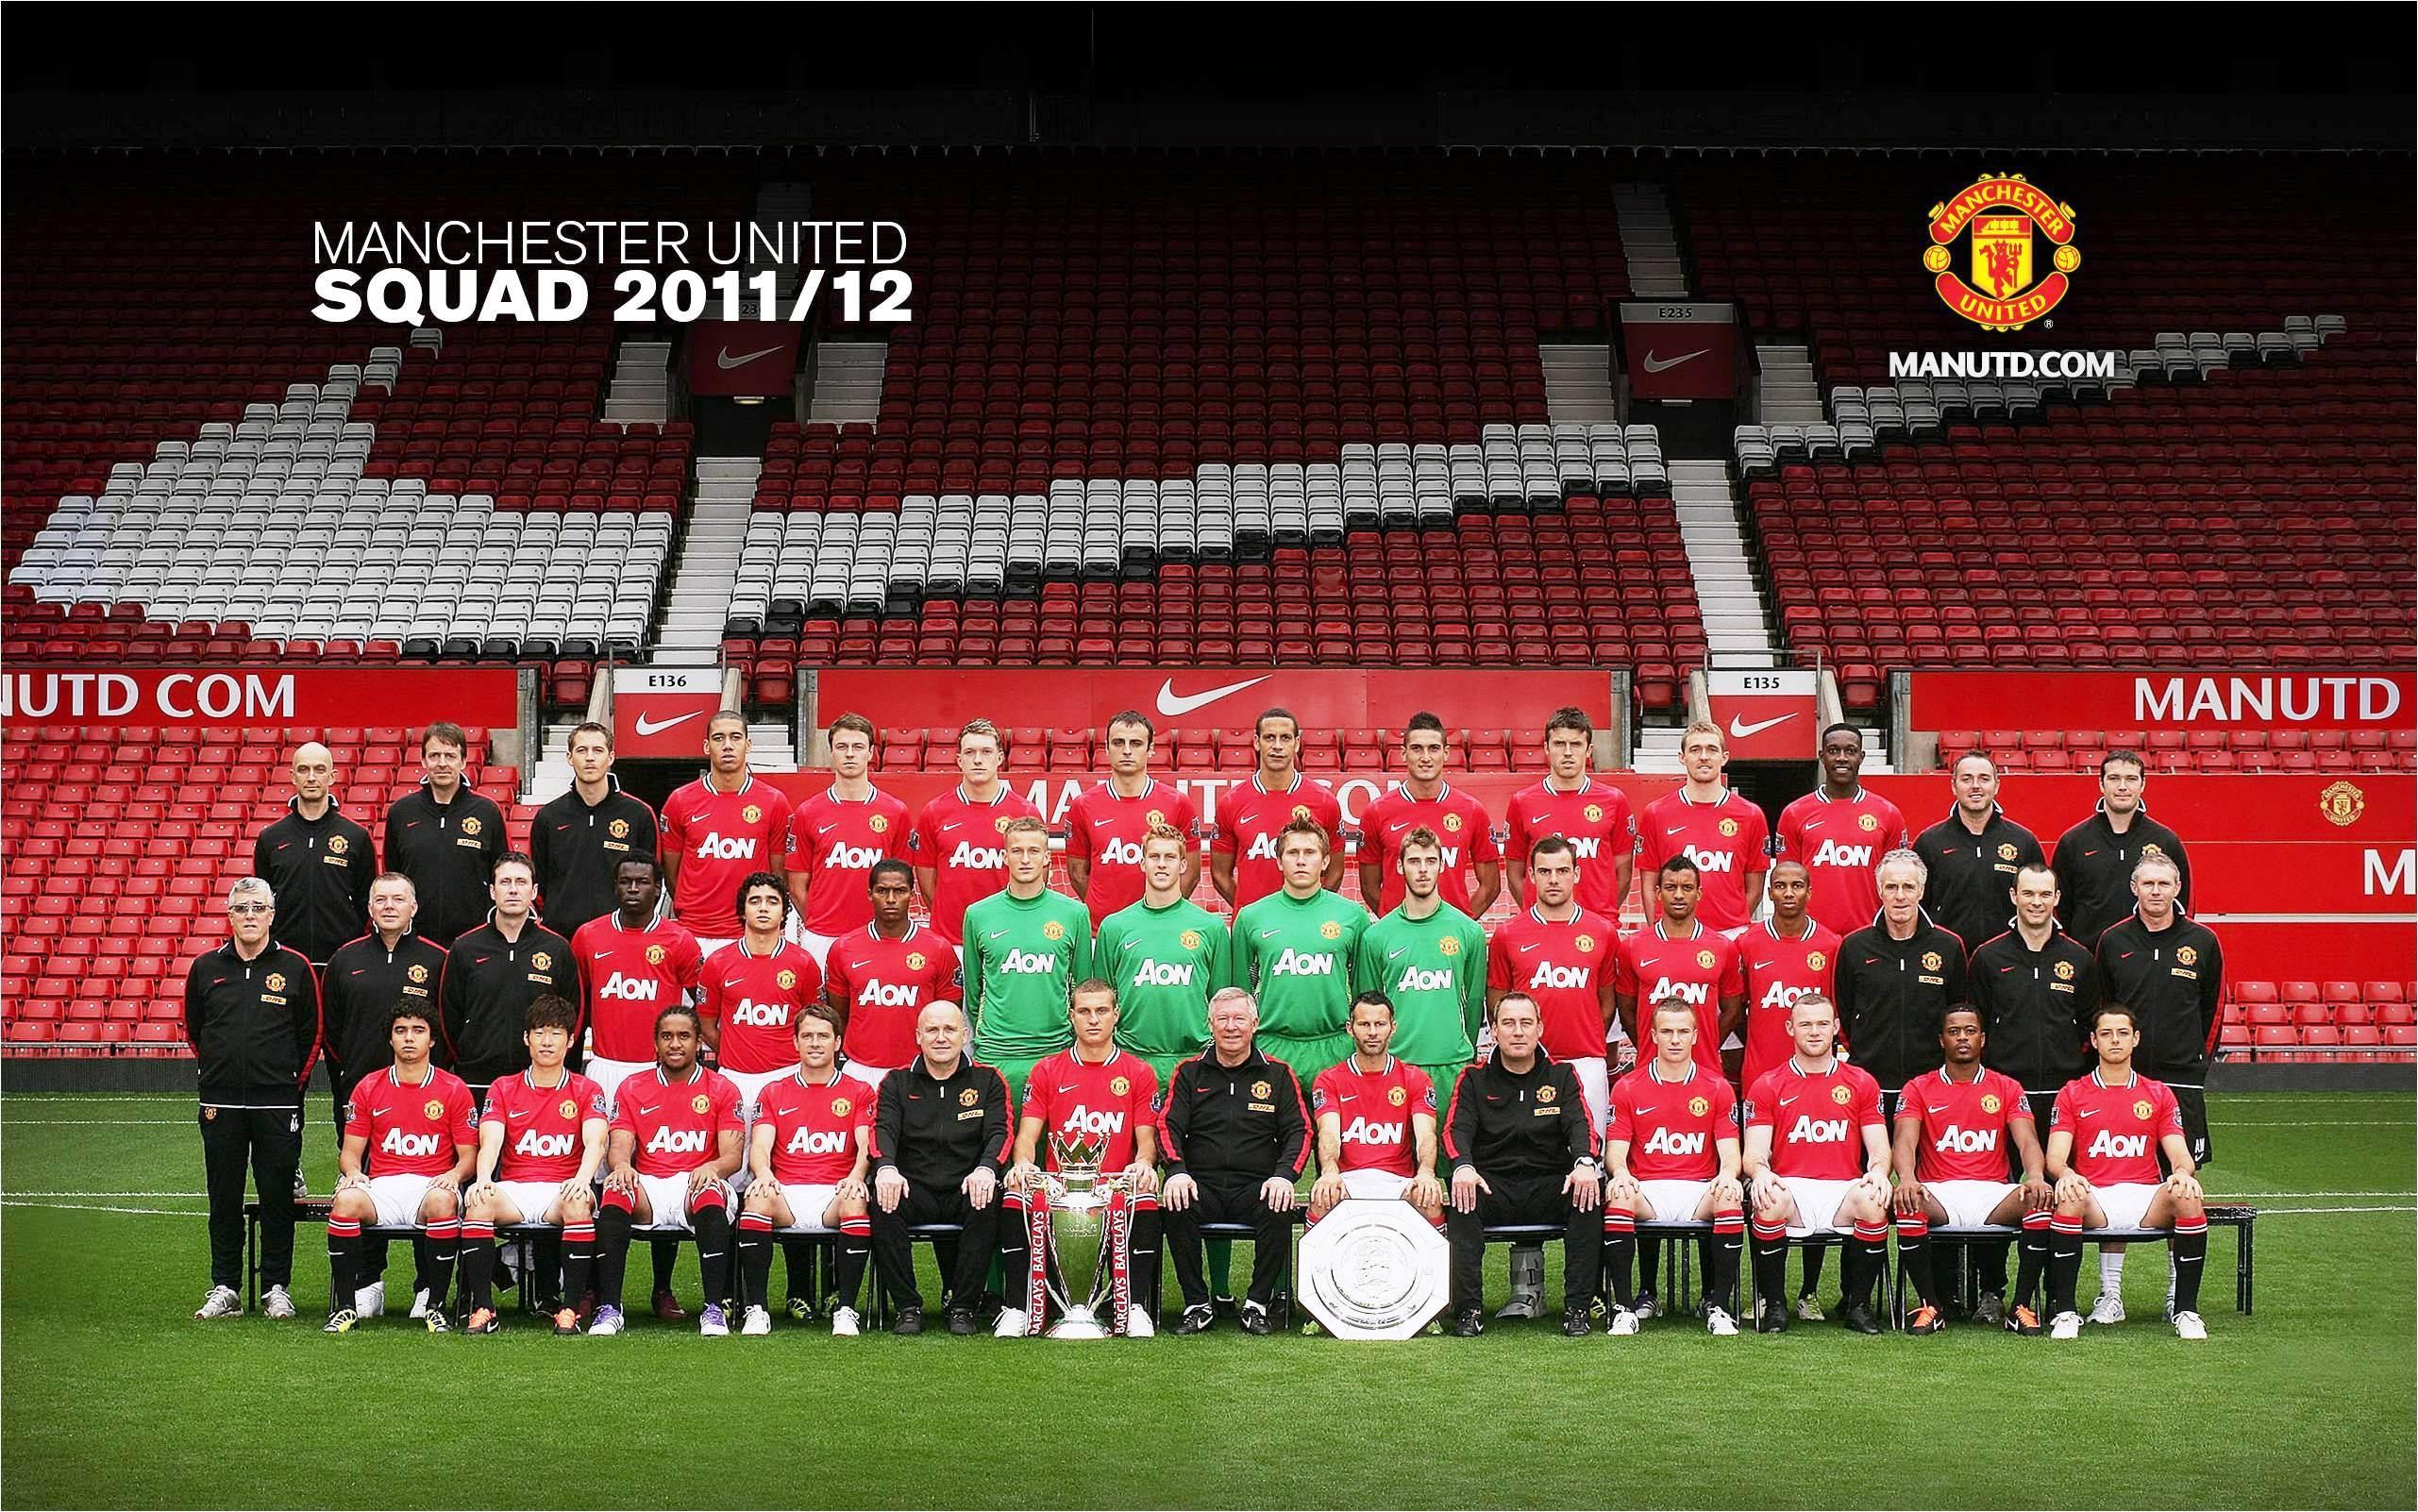 Wallpapers Logo Manchester United Terbaru 2016 Wallpaper Cave